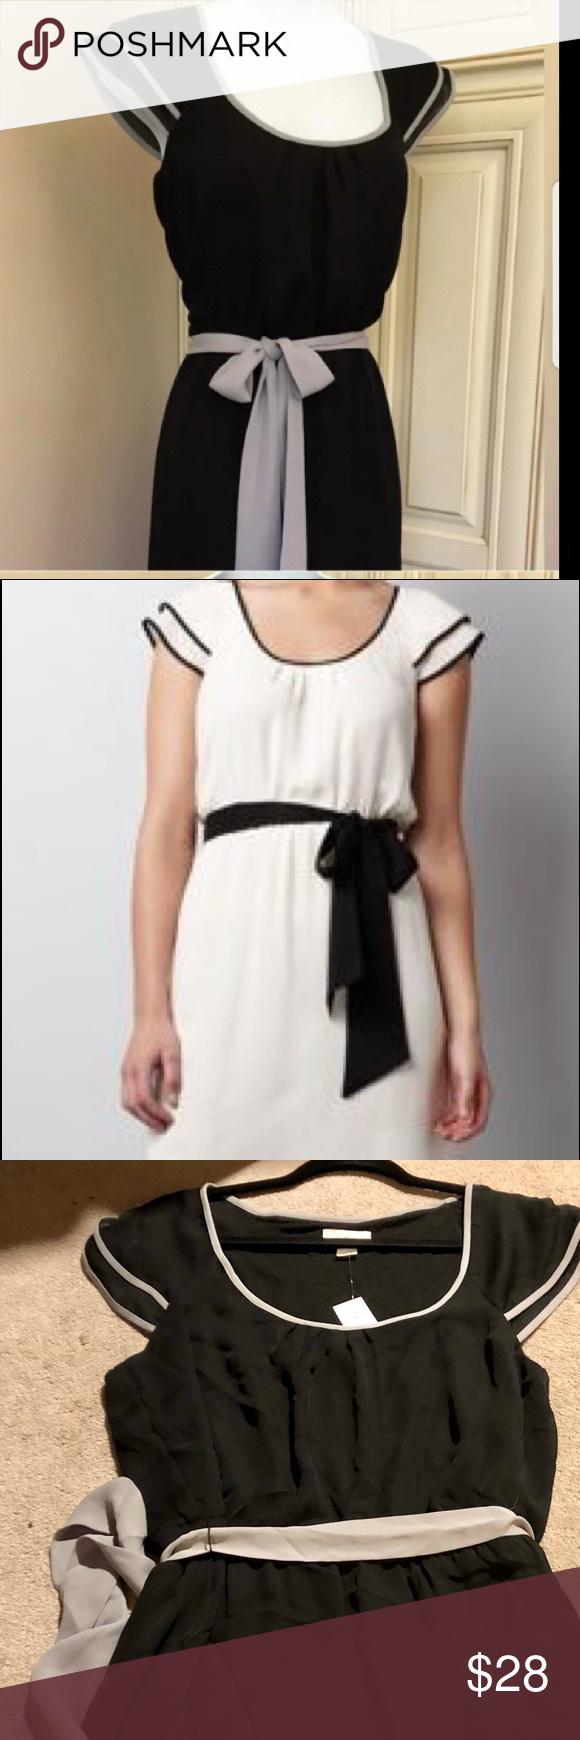 NWT LOFT flutter sleeve dress 14 NWT attached black